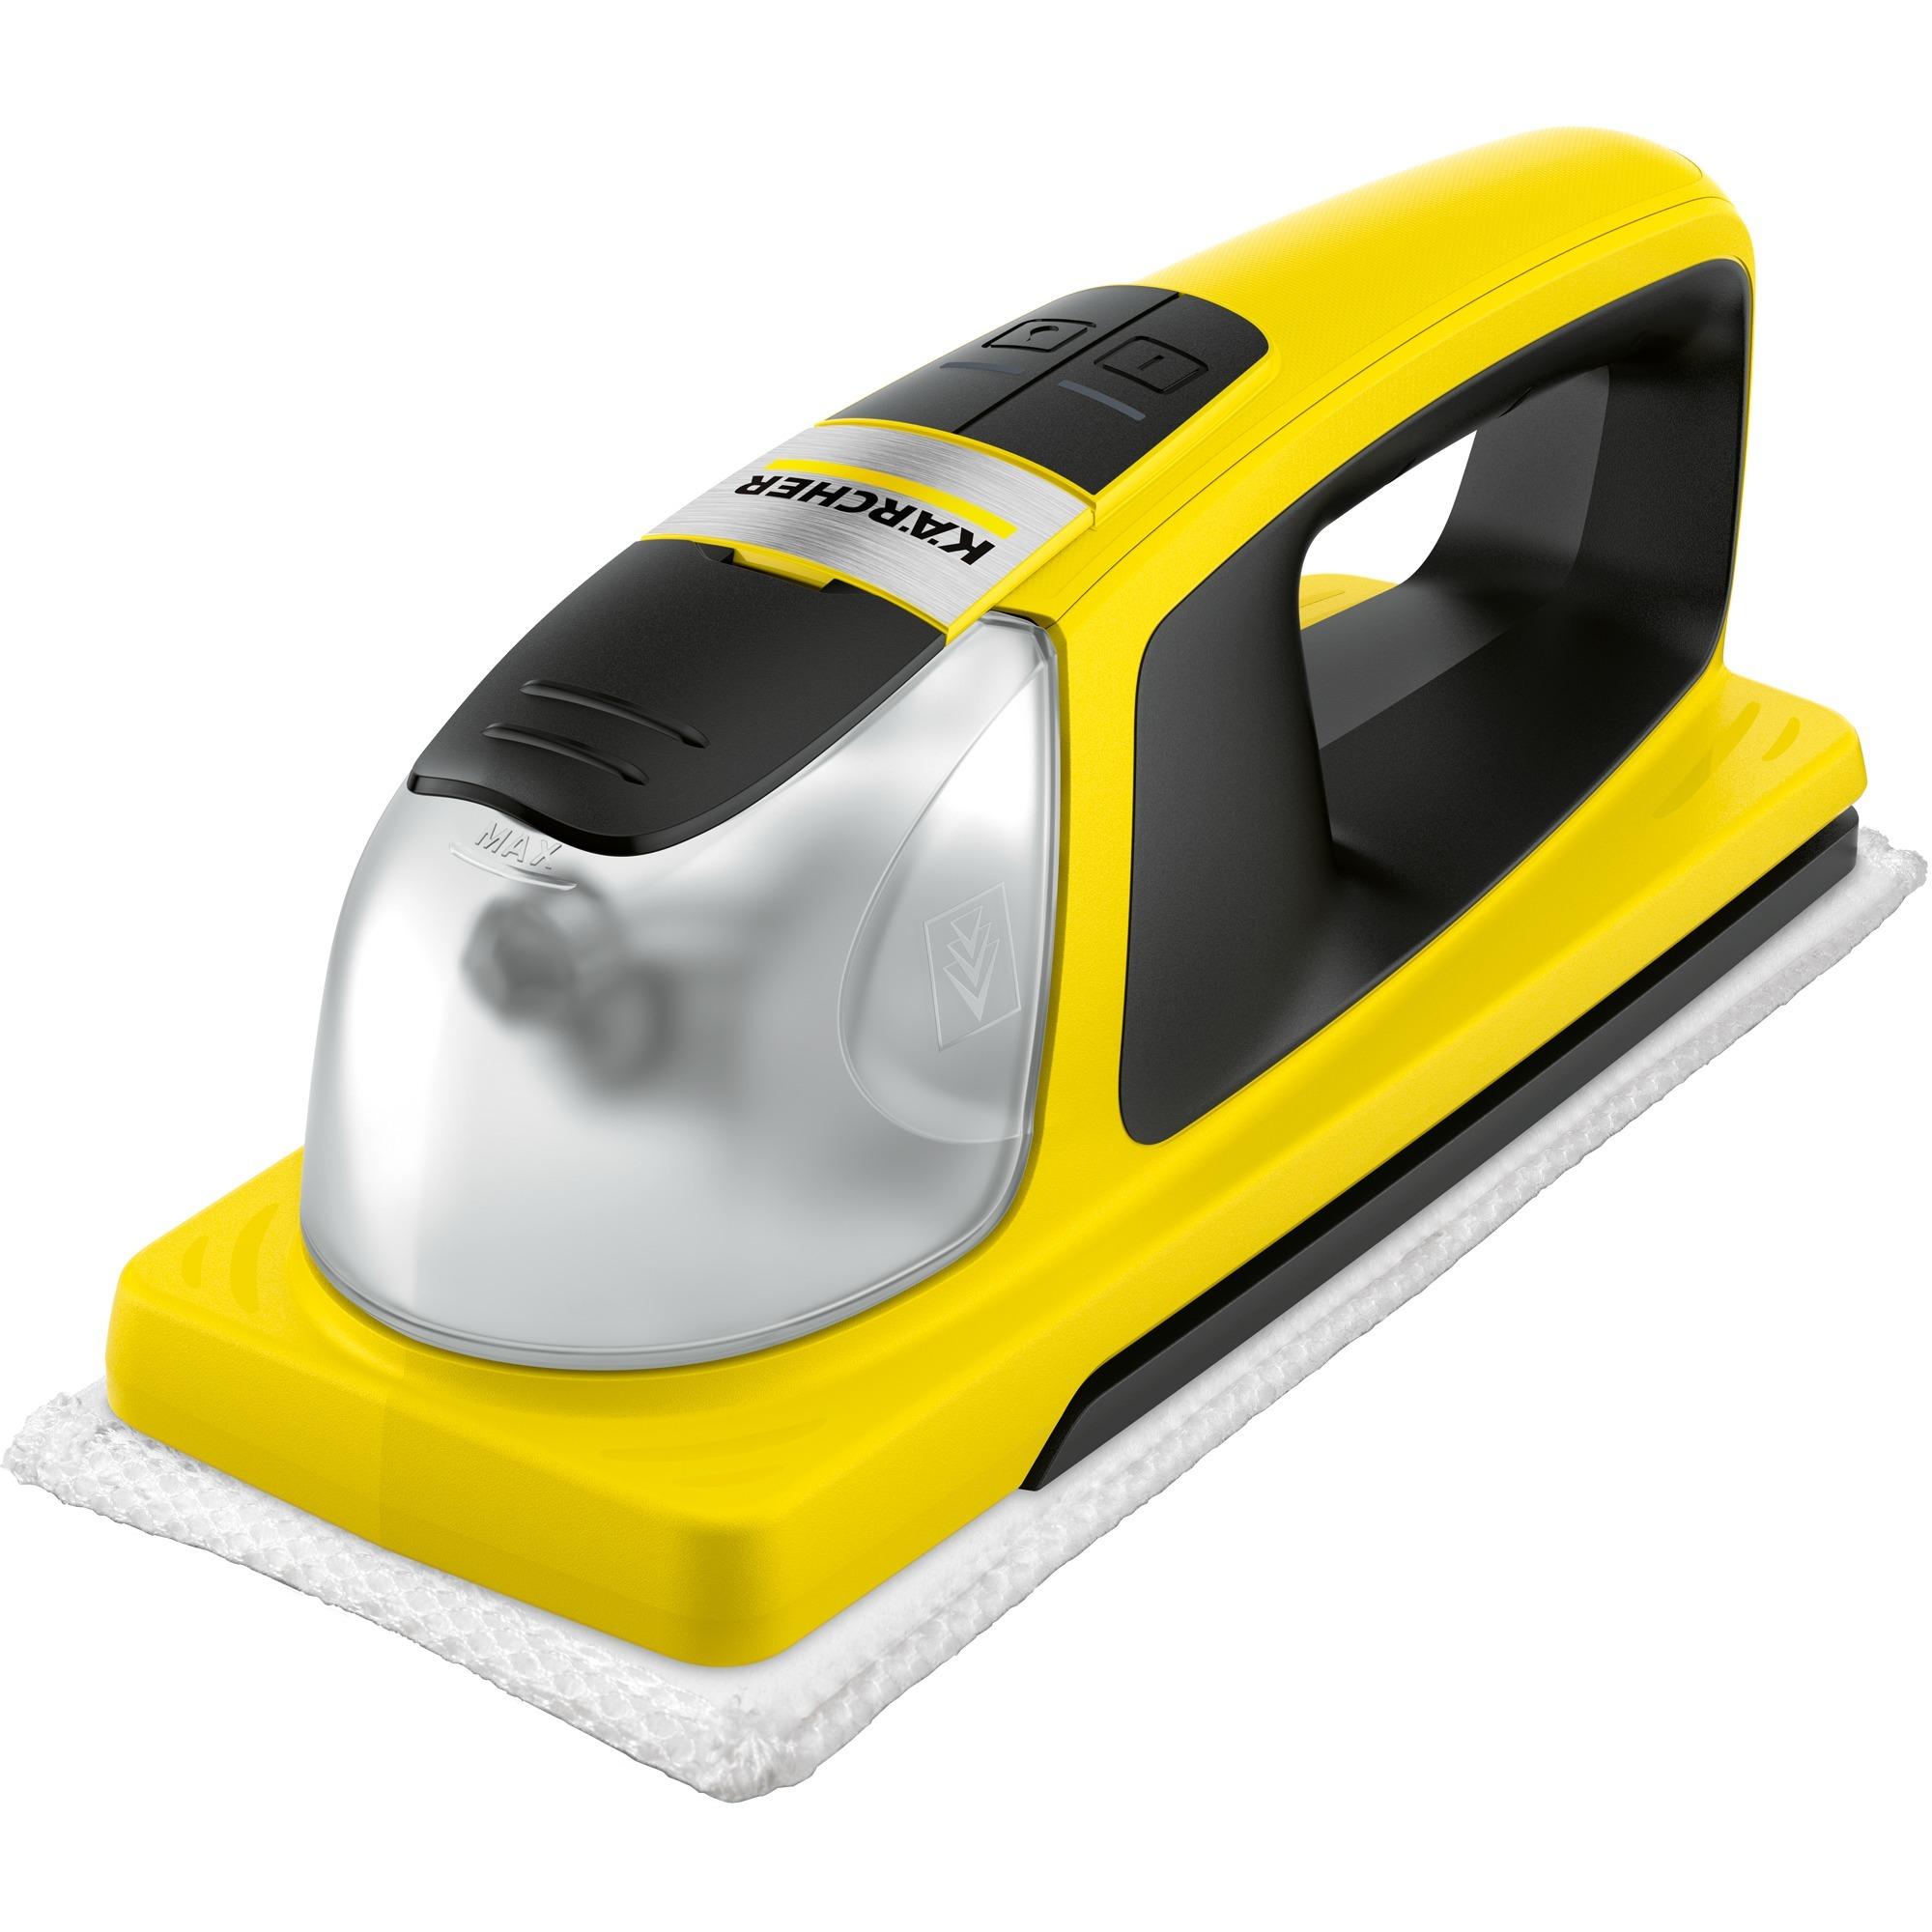 1.633-920.0 limpiador eléctrico ventana Negro, Amarillo 0,02 L, Limpiador de ventanas